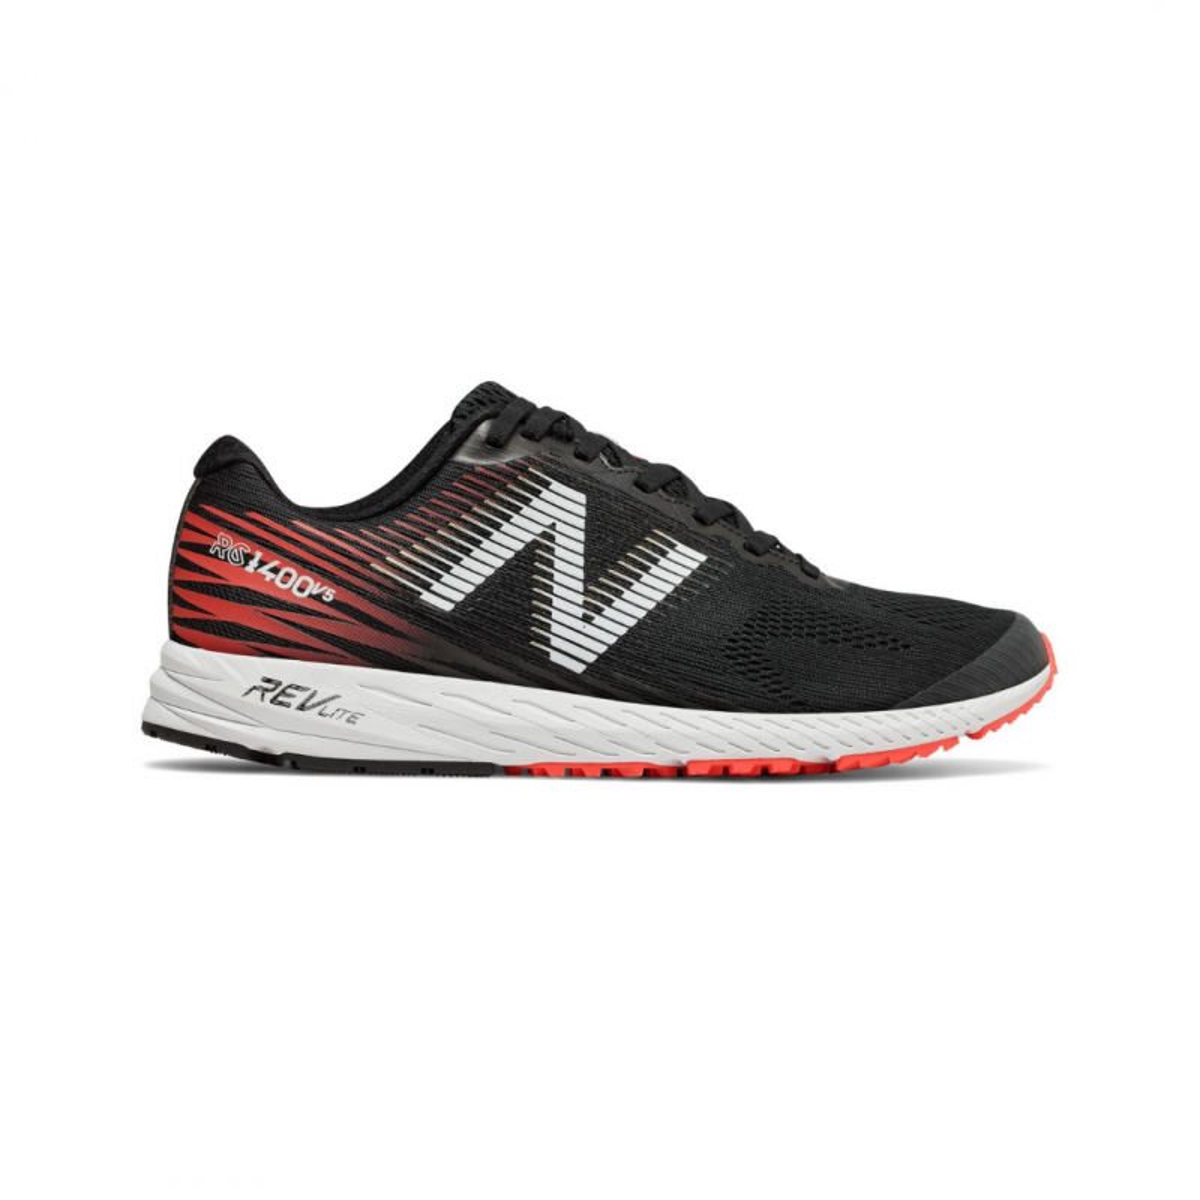 New Balance 1400 V5 Black Red Men's Shoes